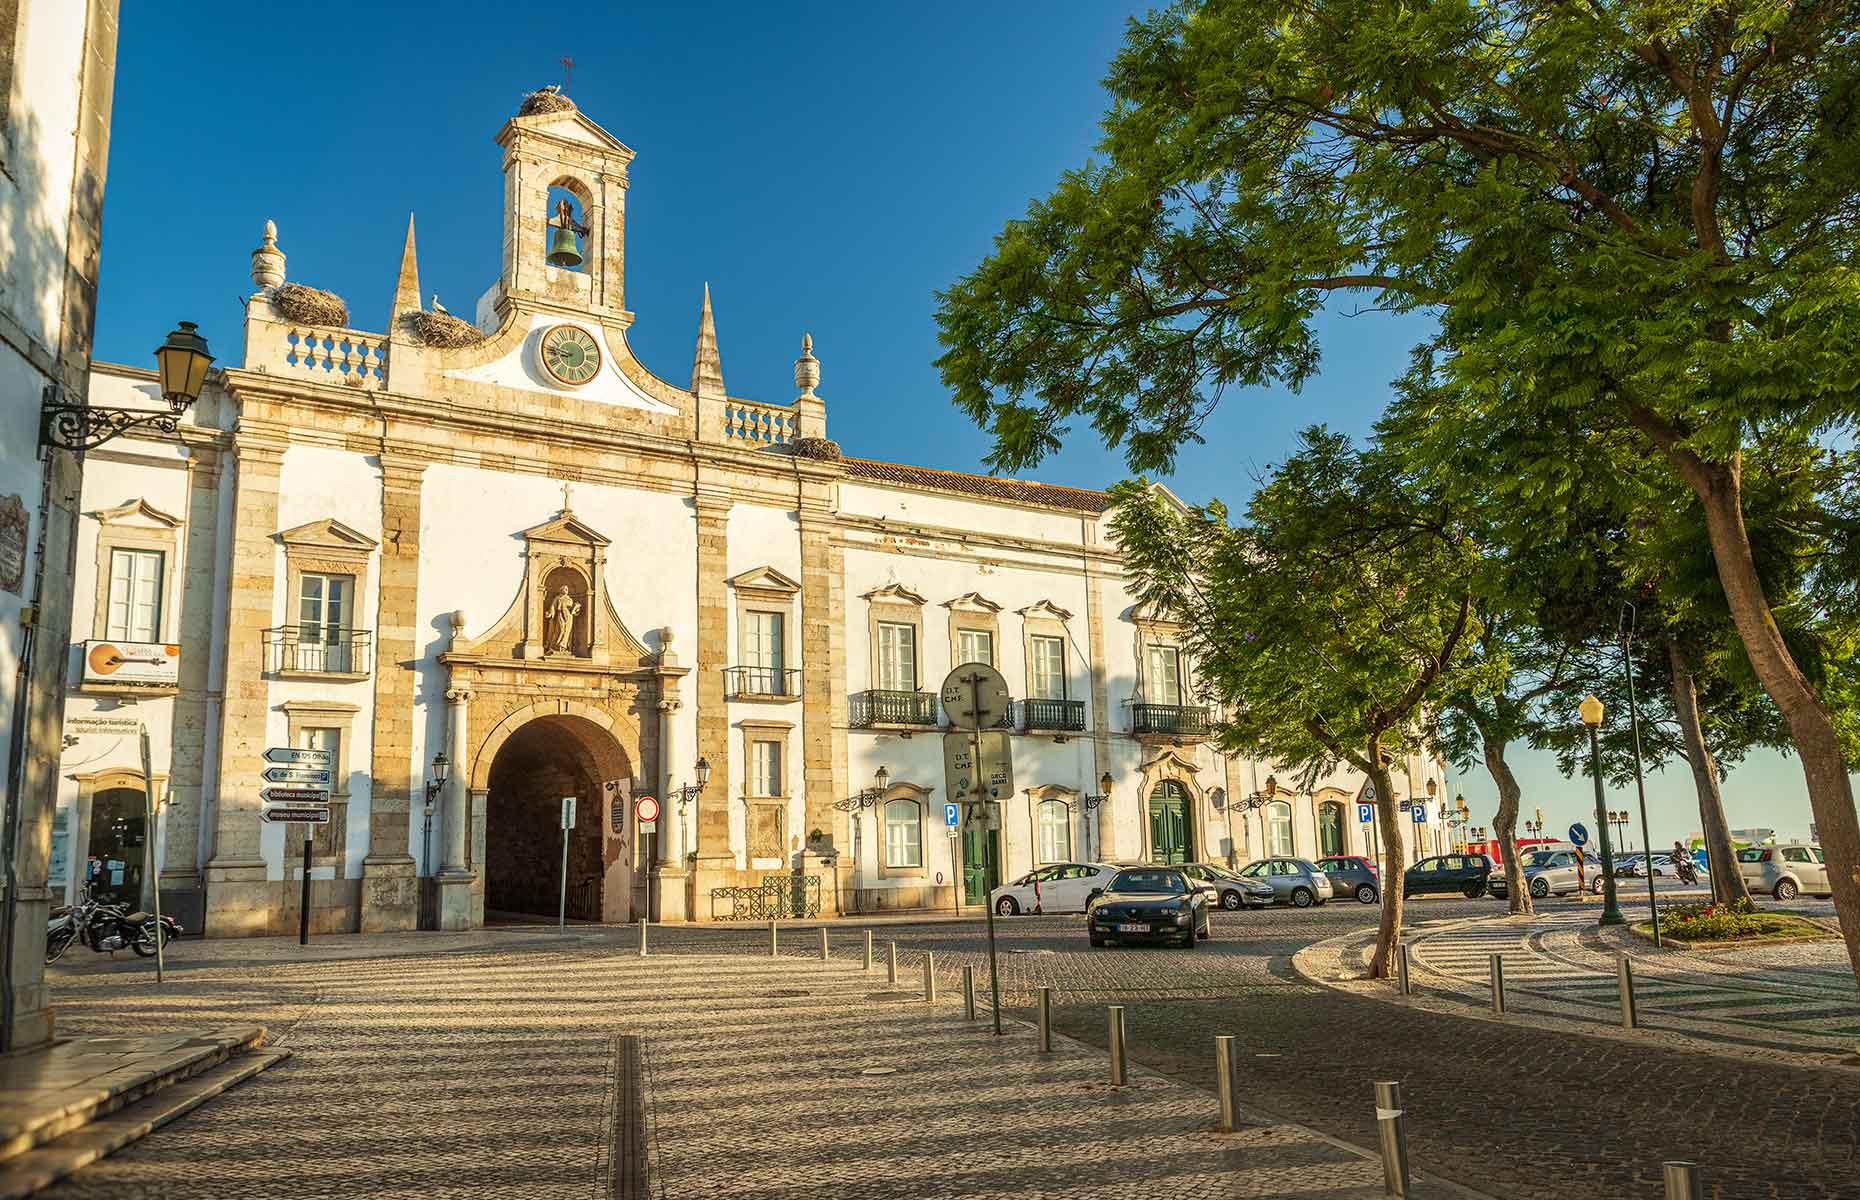 Faro's Arco da Vila in the front of the town hall (Image: Luis Pedro Fonseca/Shutterstock)